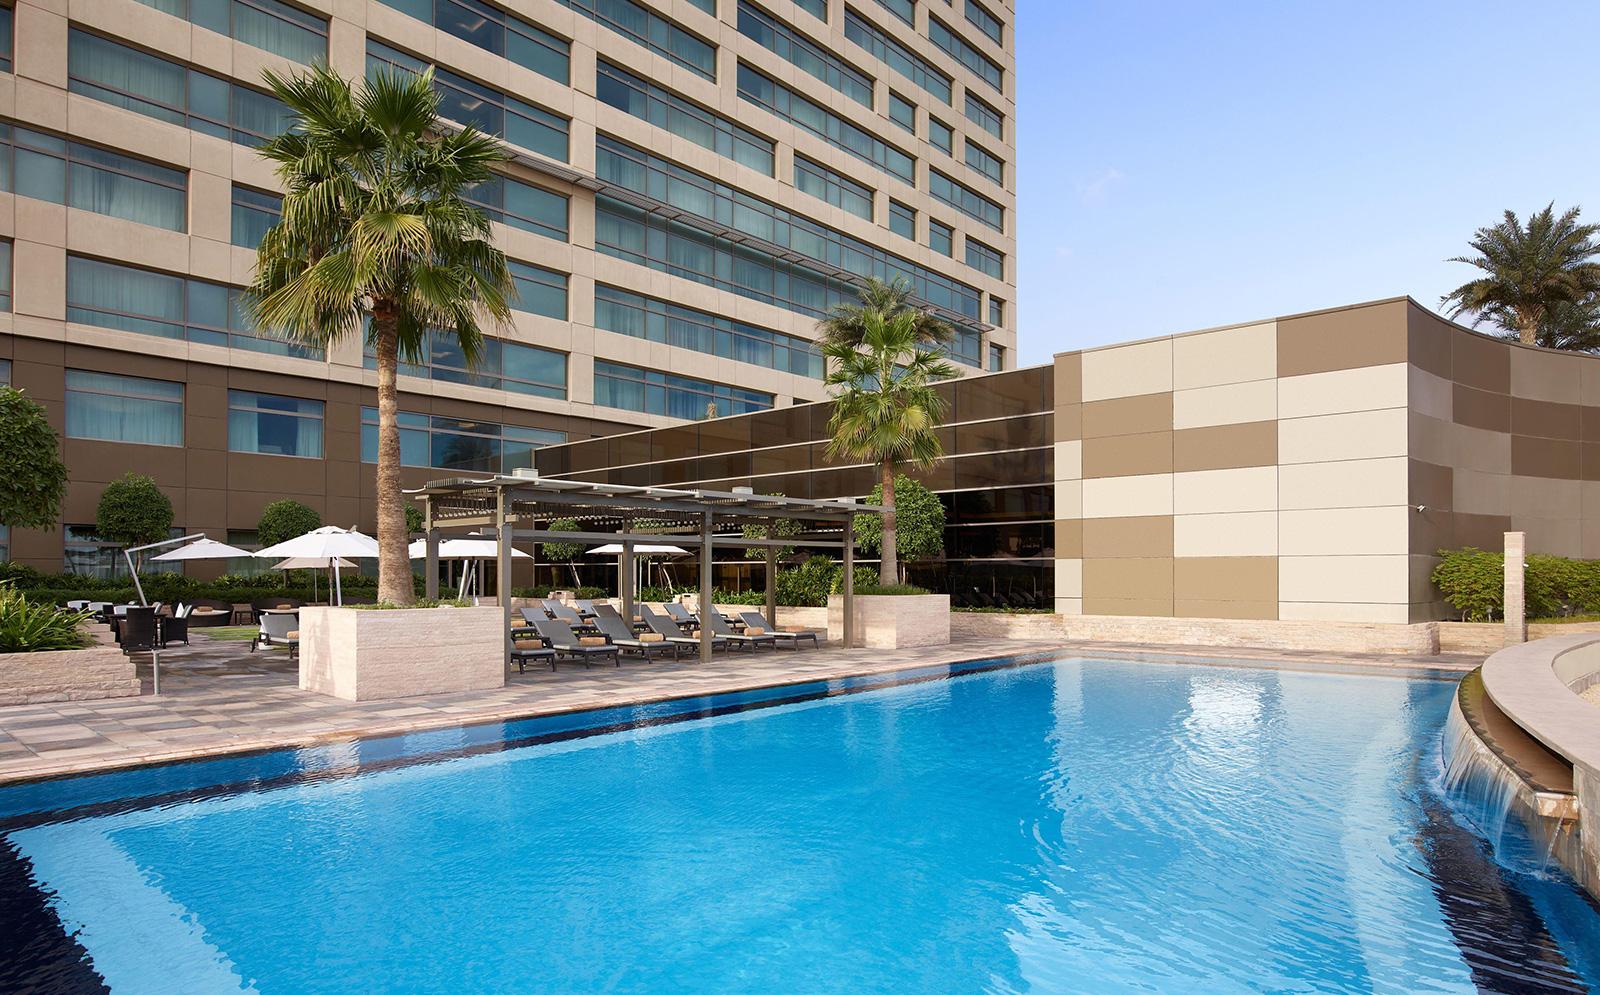 Christmas in Dubai: Things You Can do This Festive Season!